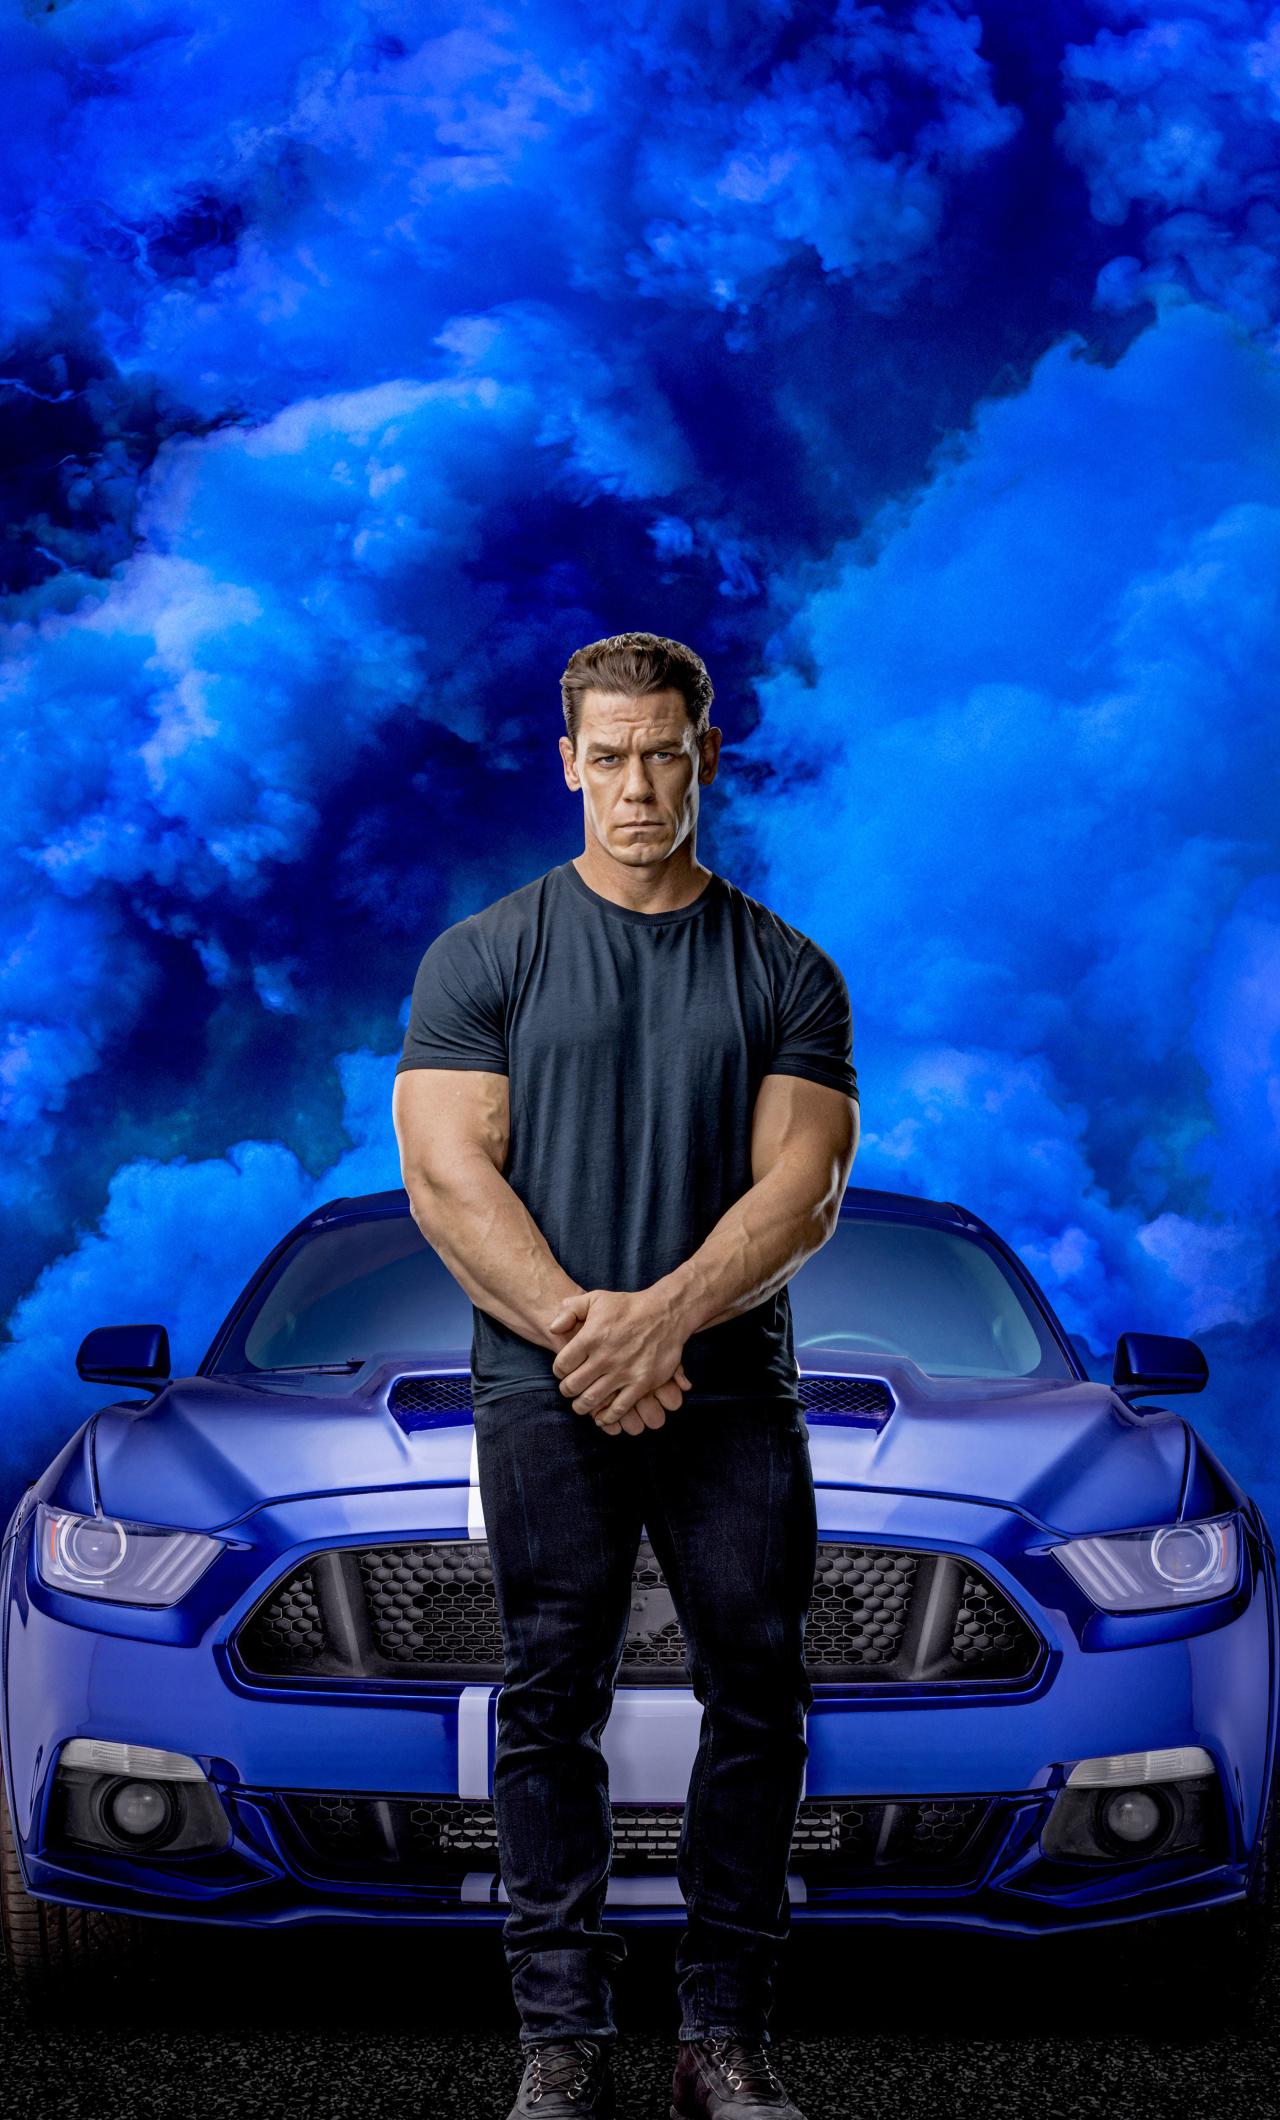 1280x2120 John Cena Fast And Furious 9 iPhone 6 plus ...